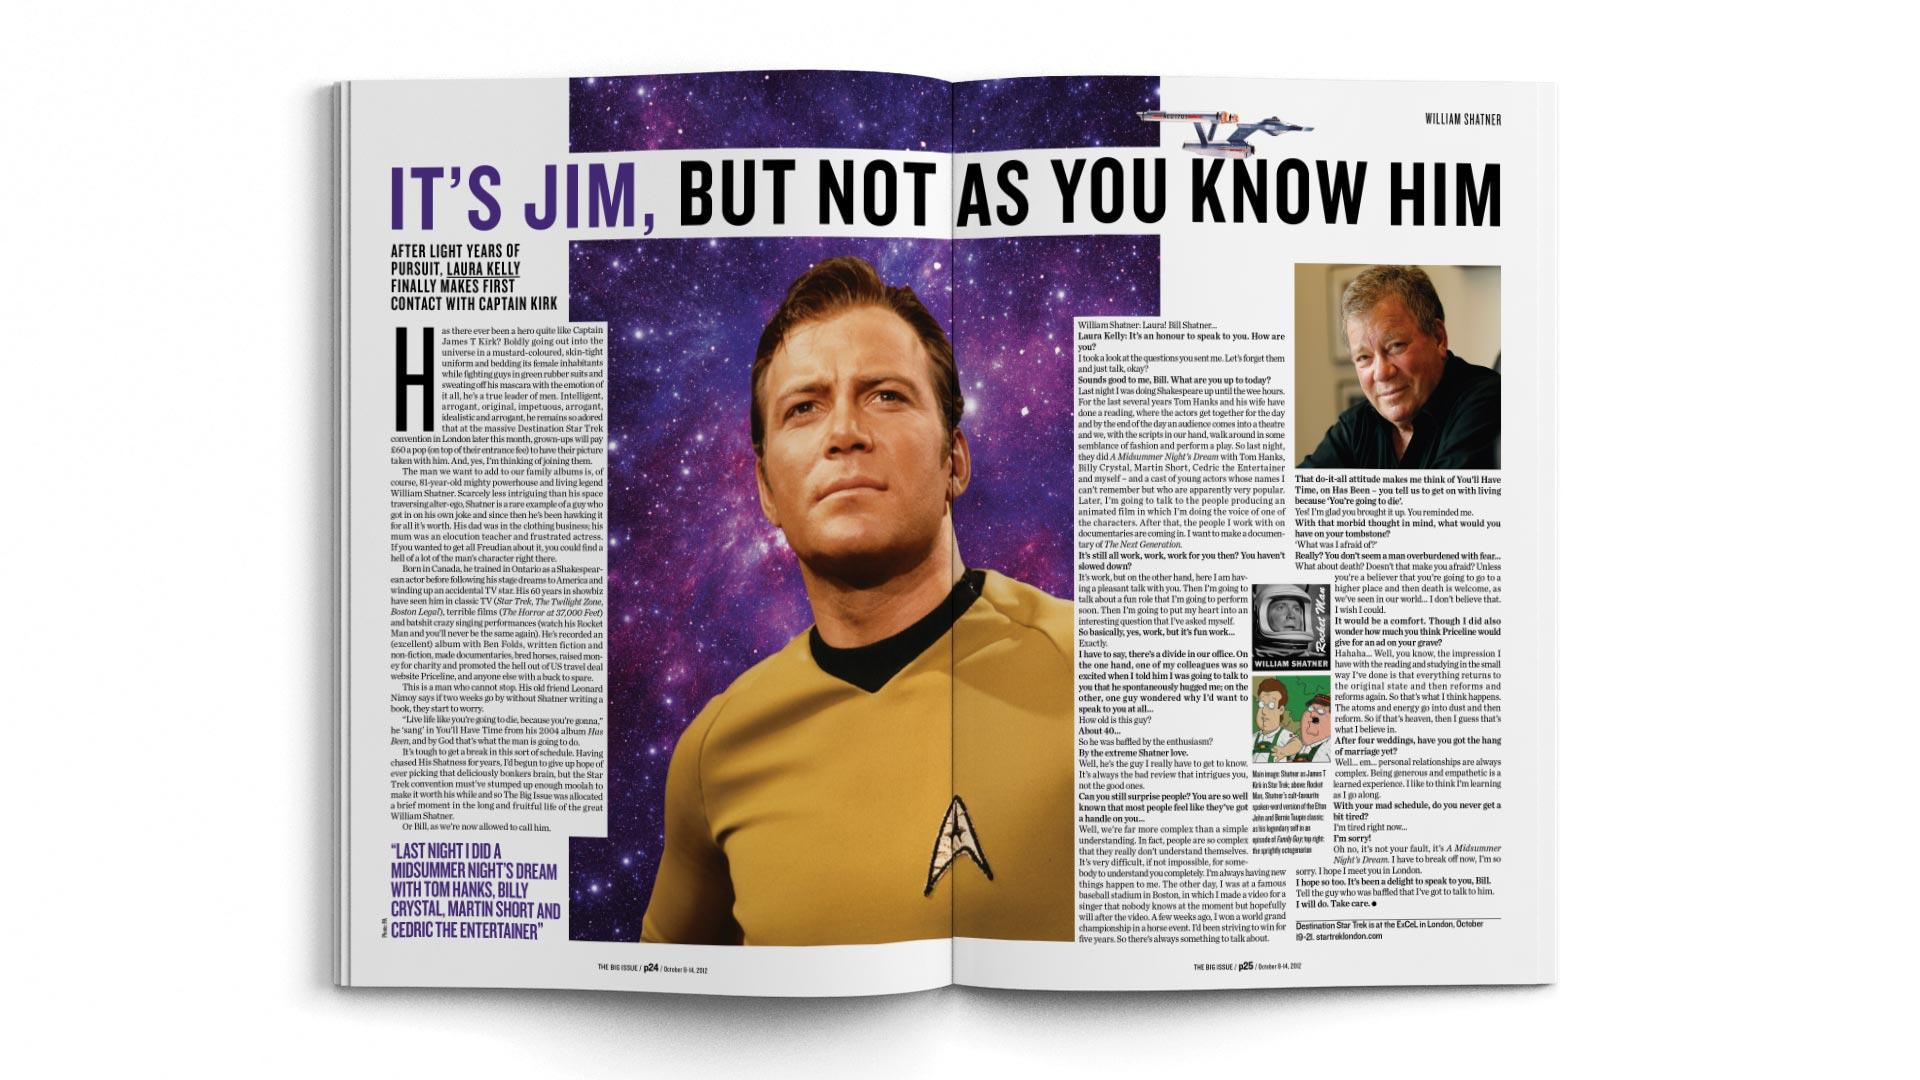 A4-Magazine-DPS-TBI-William-Shatner